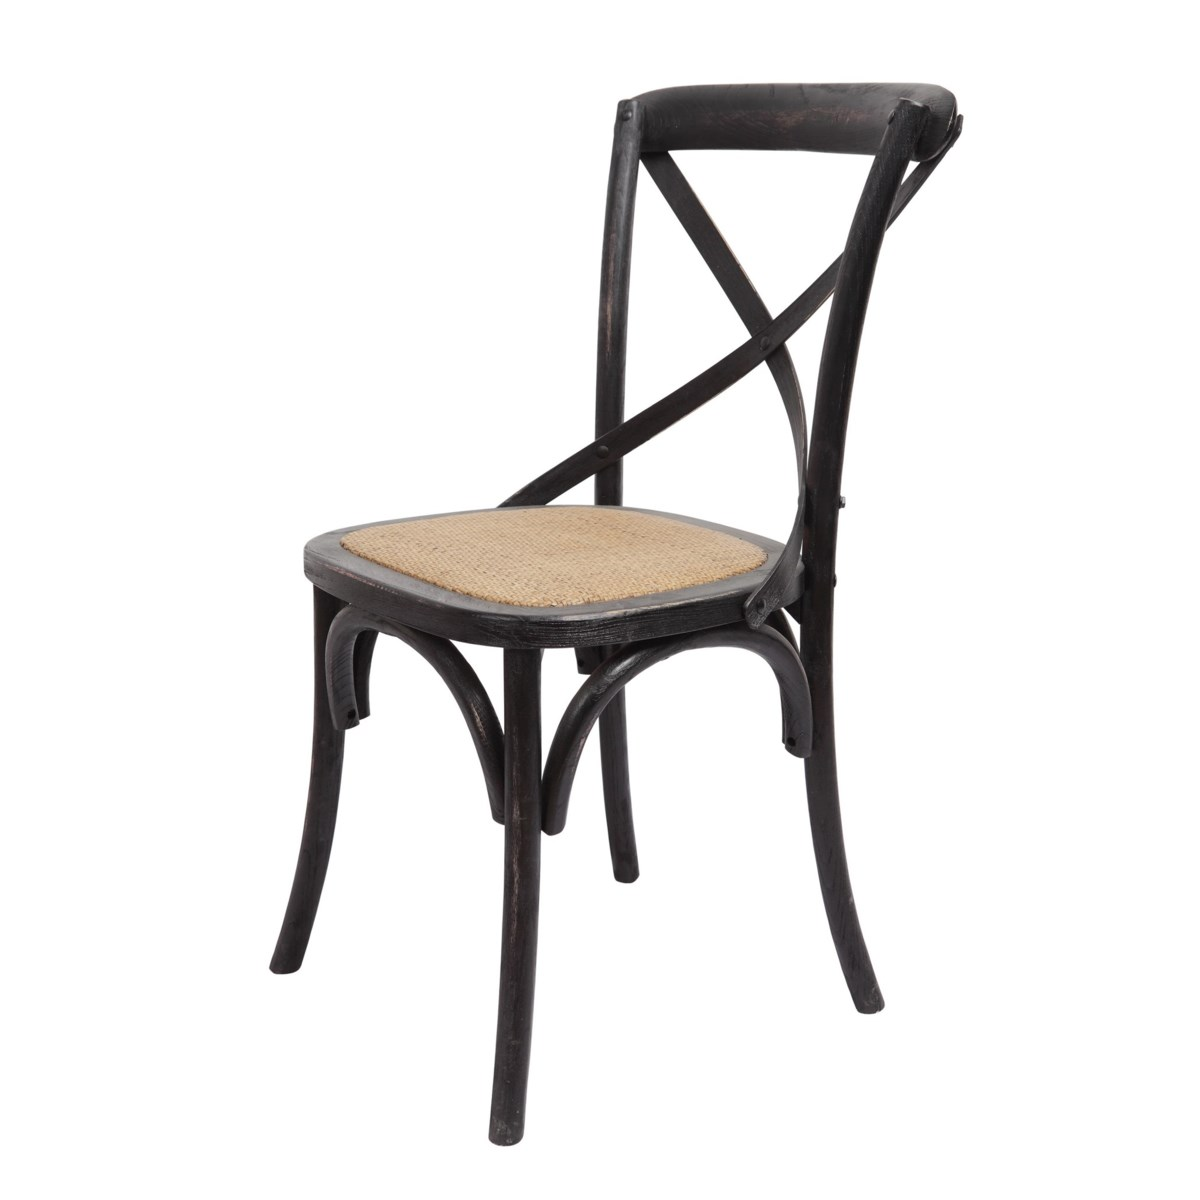 -Brody X-Back Side Chair (Black Wash)